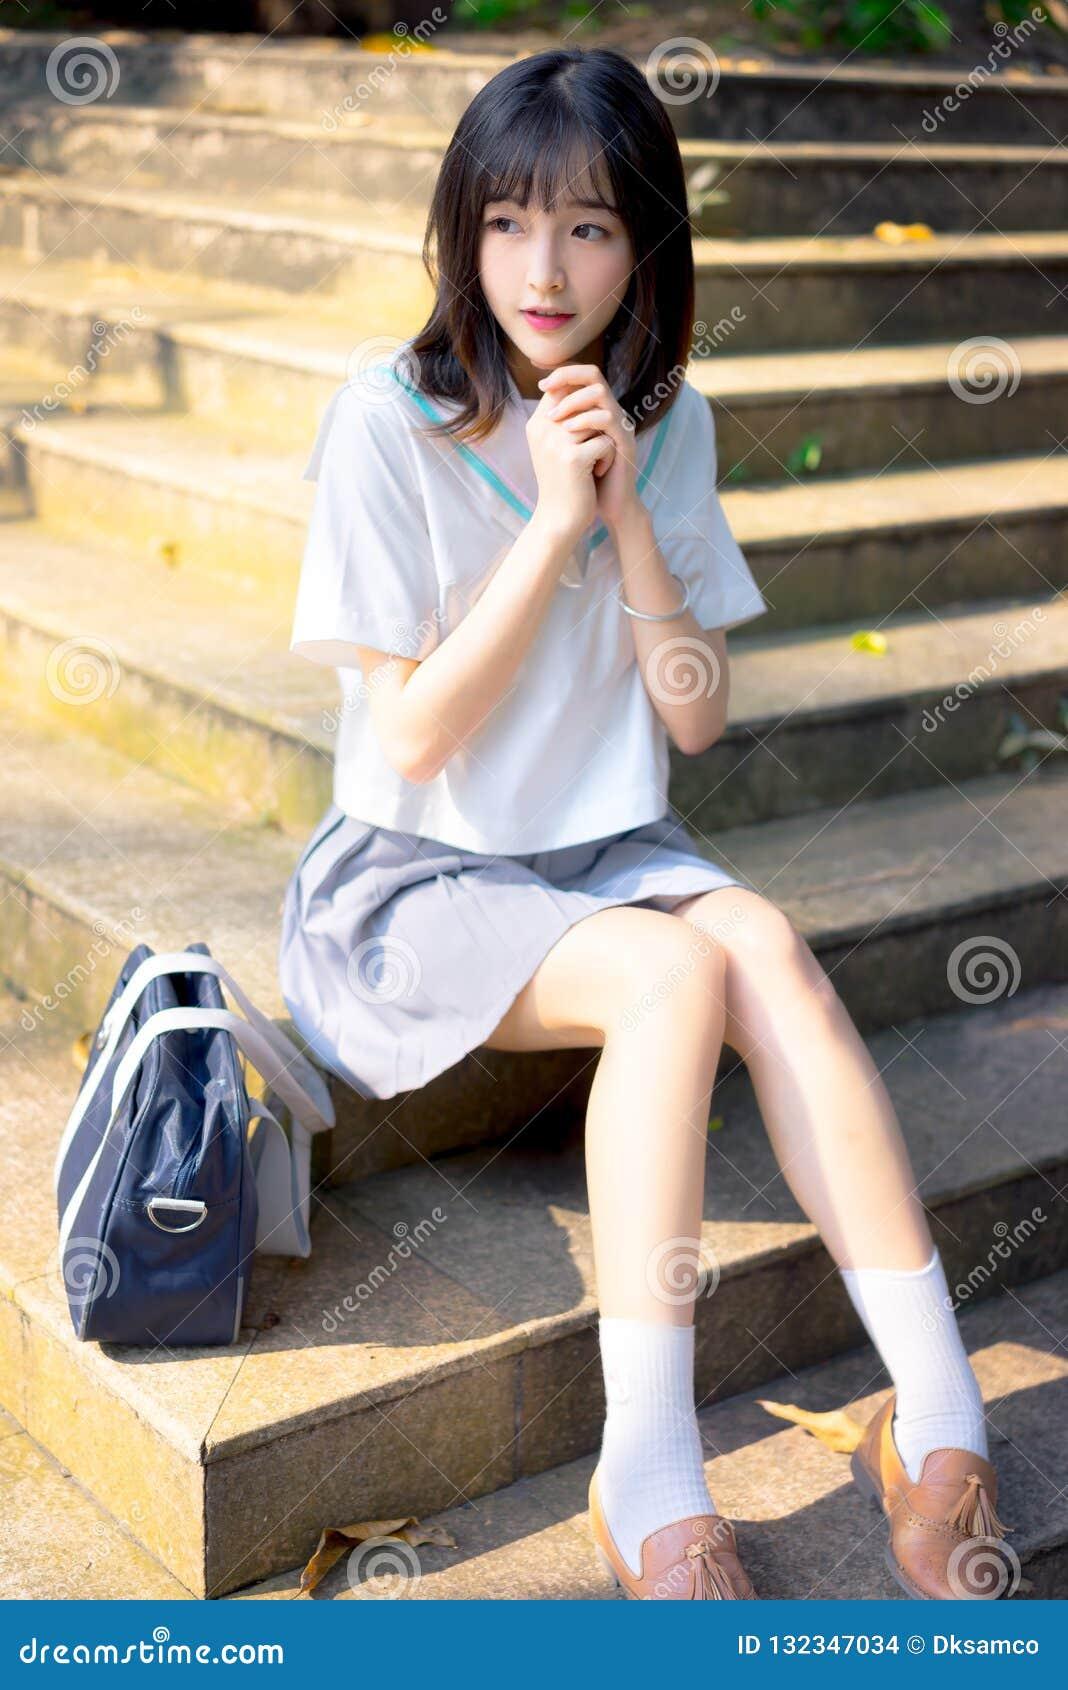 cheating outdoor uniform Asian